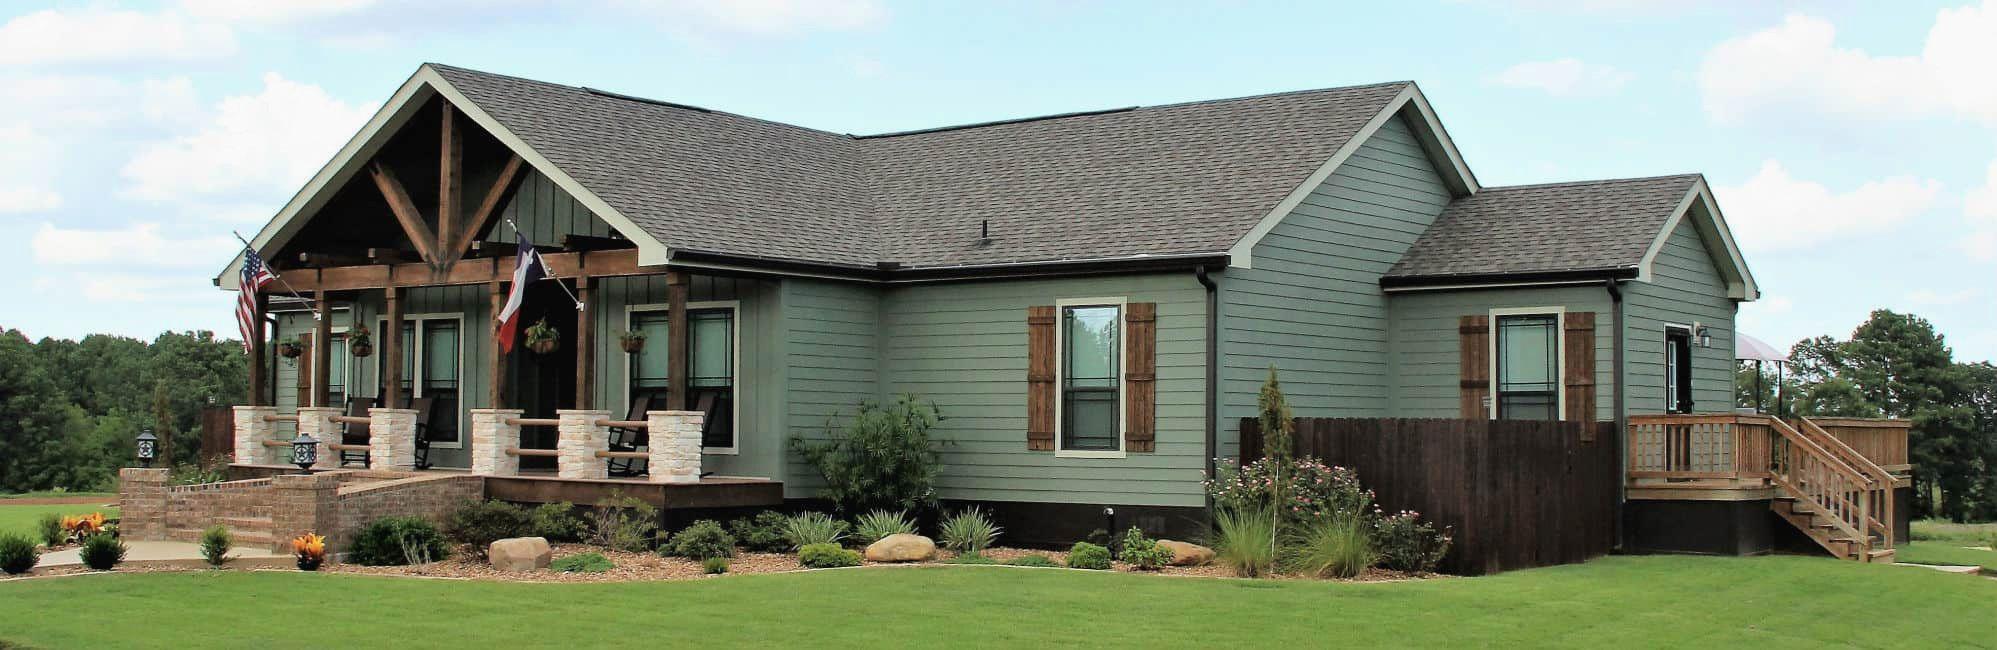 clayton tiny homes prices